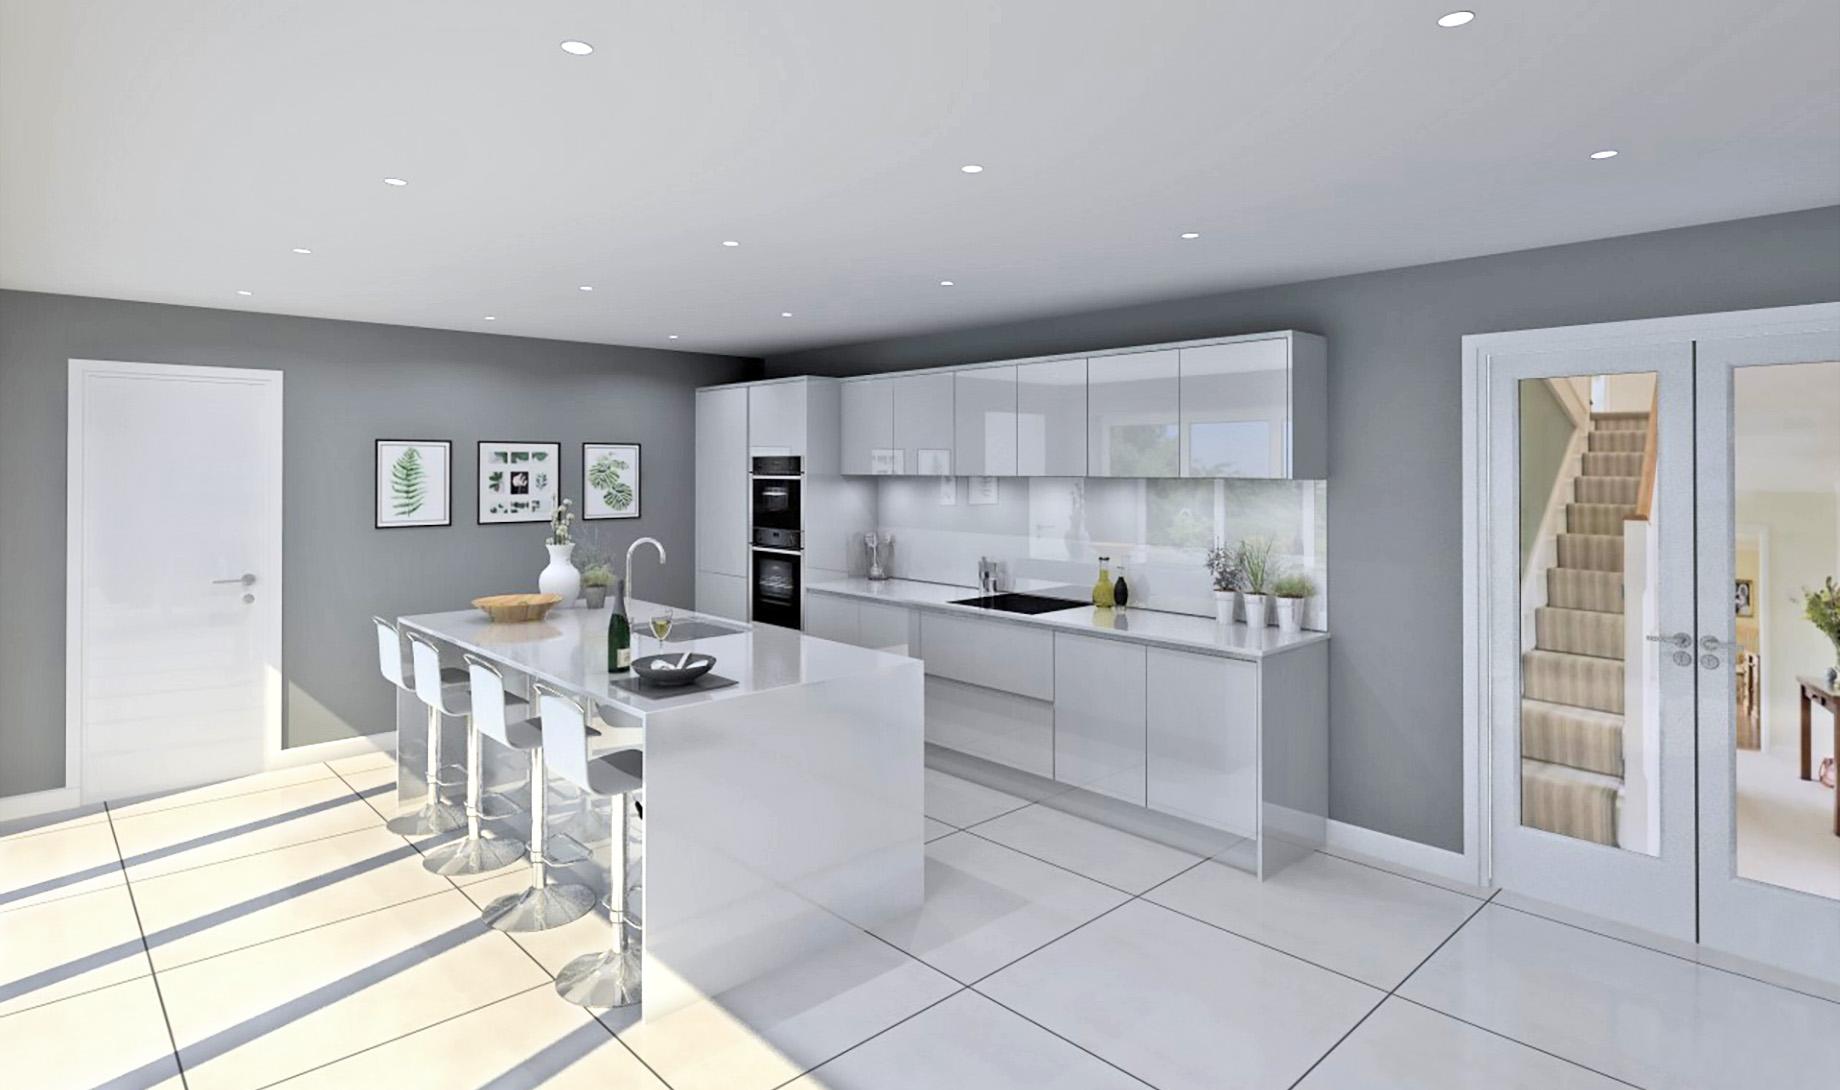 The Middleton Kitchen/Dining